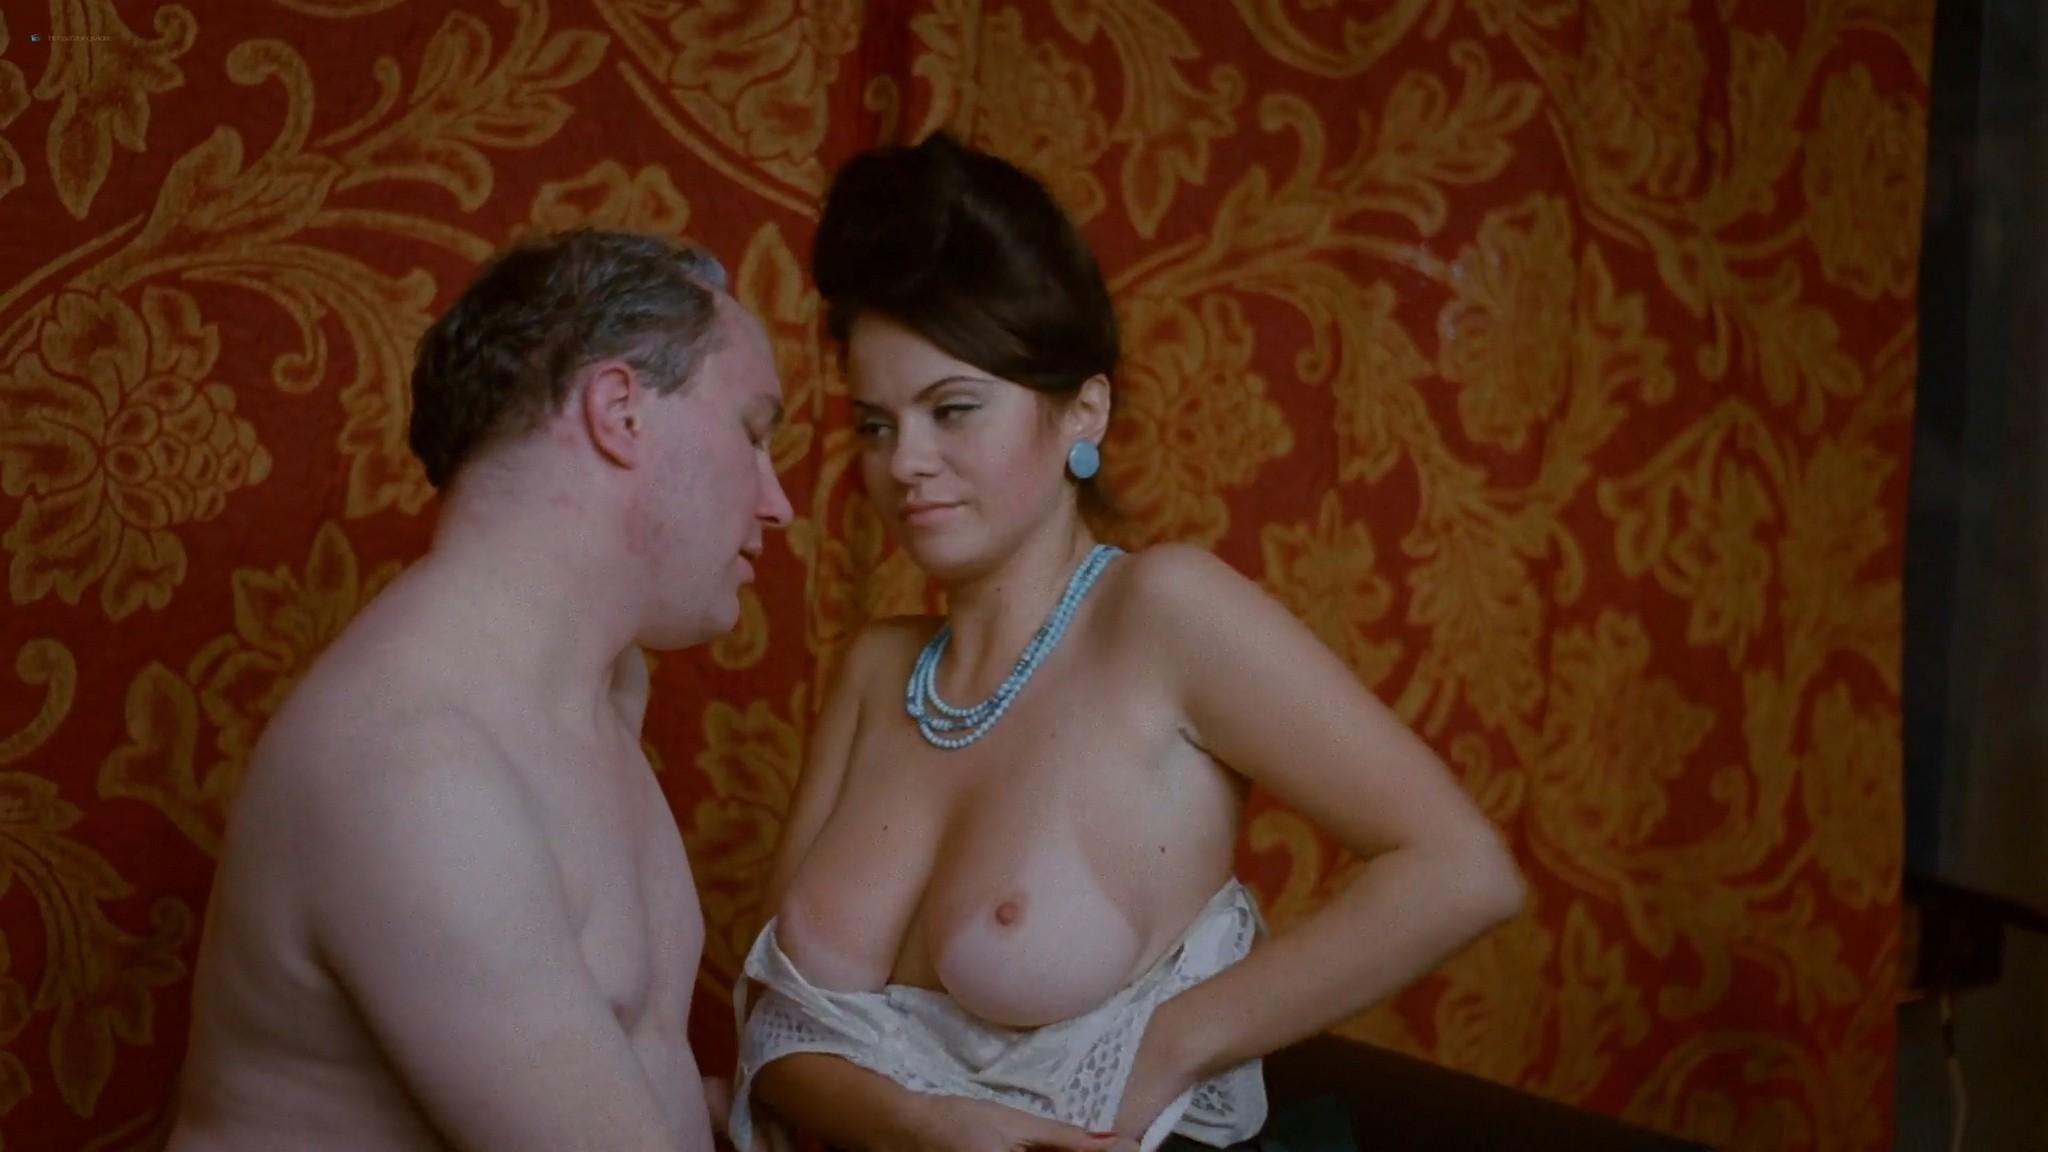 Kristina Babich nude sex Viktoria Skitskaya, Kristina Voloshina nude too- DAU Degeneratsiya (2020) HD 1080p (13)